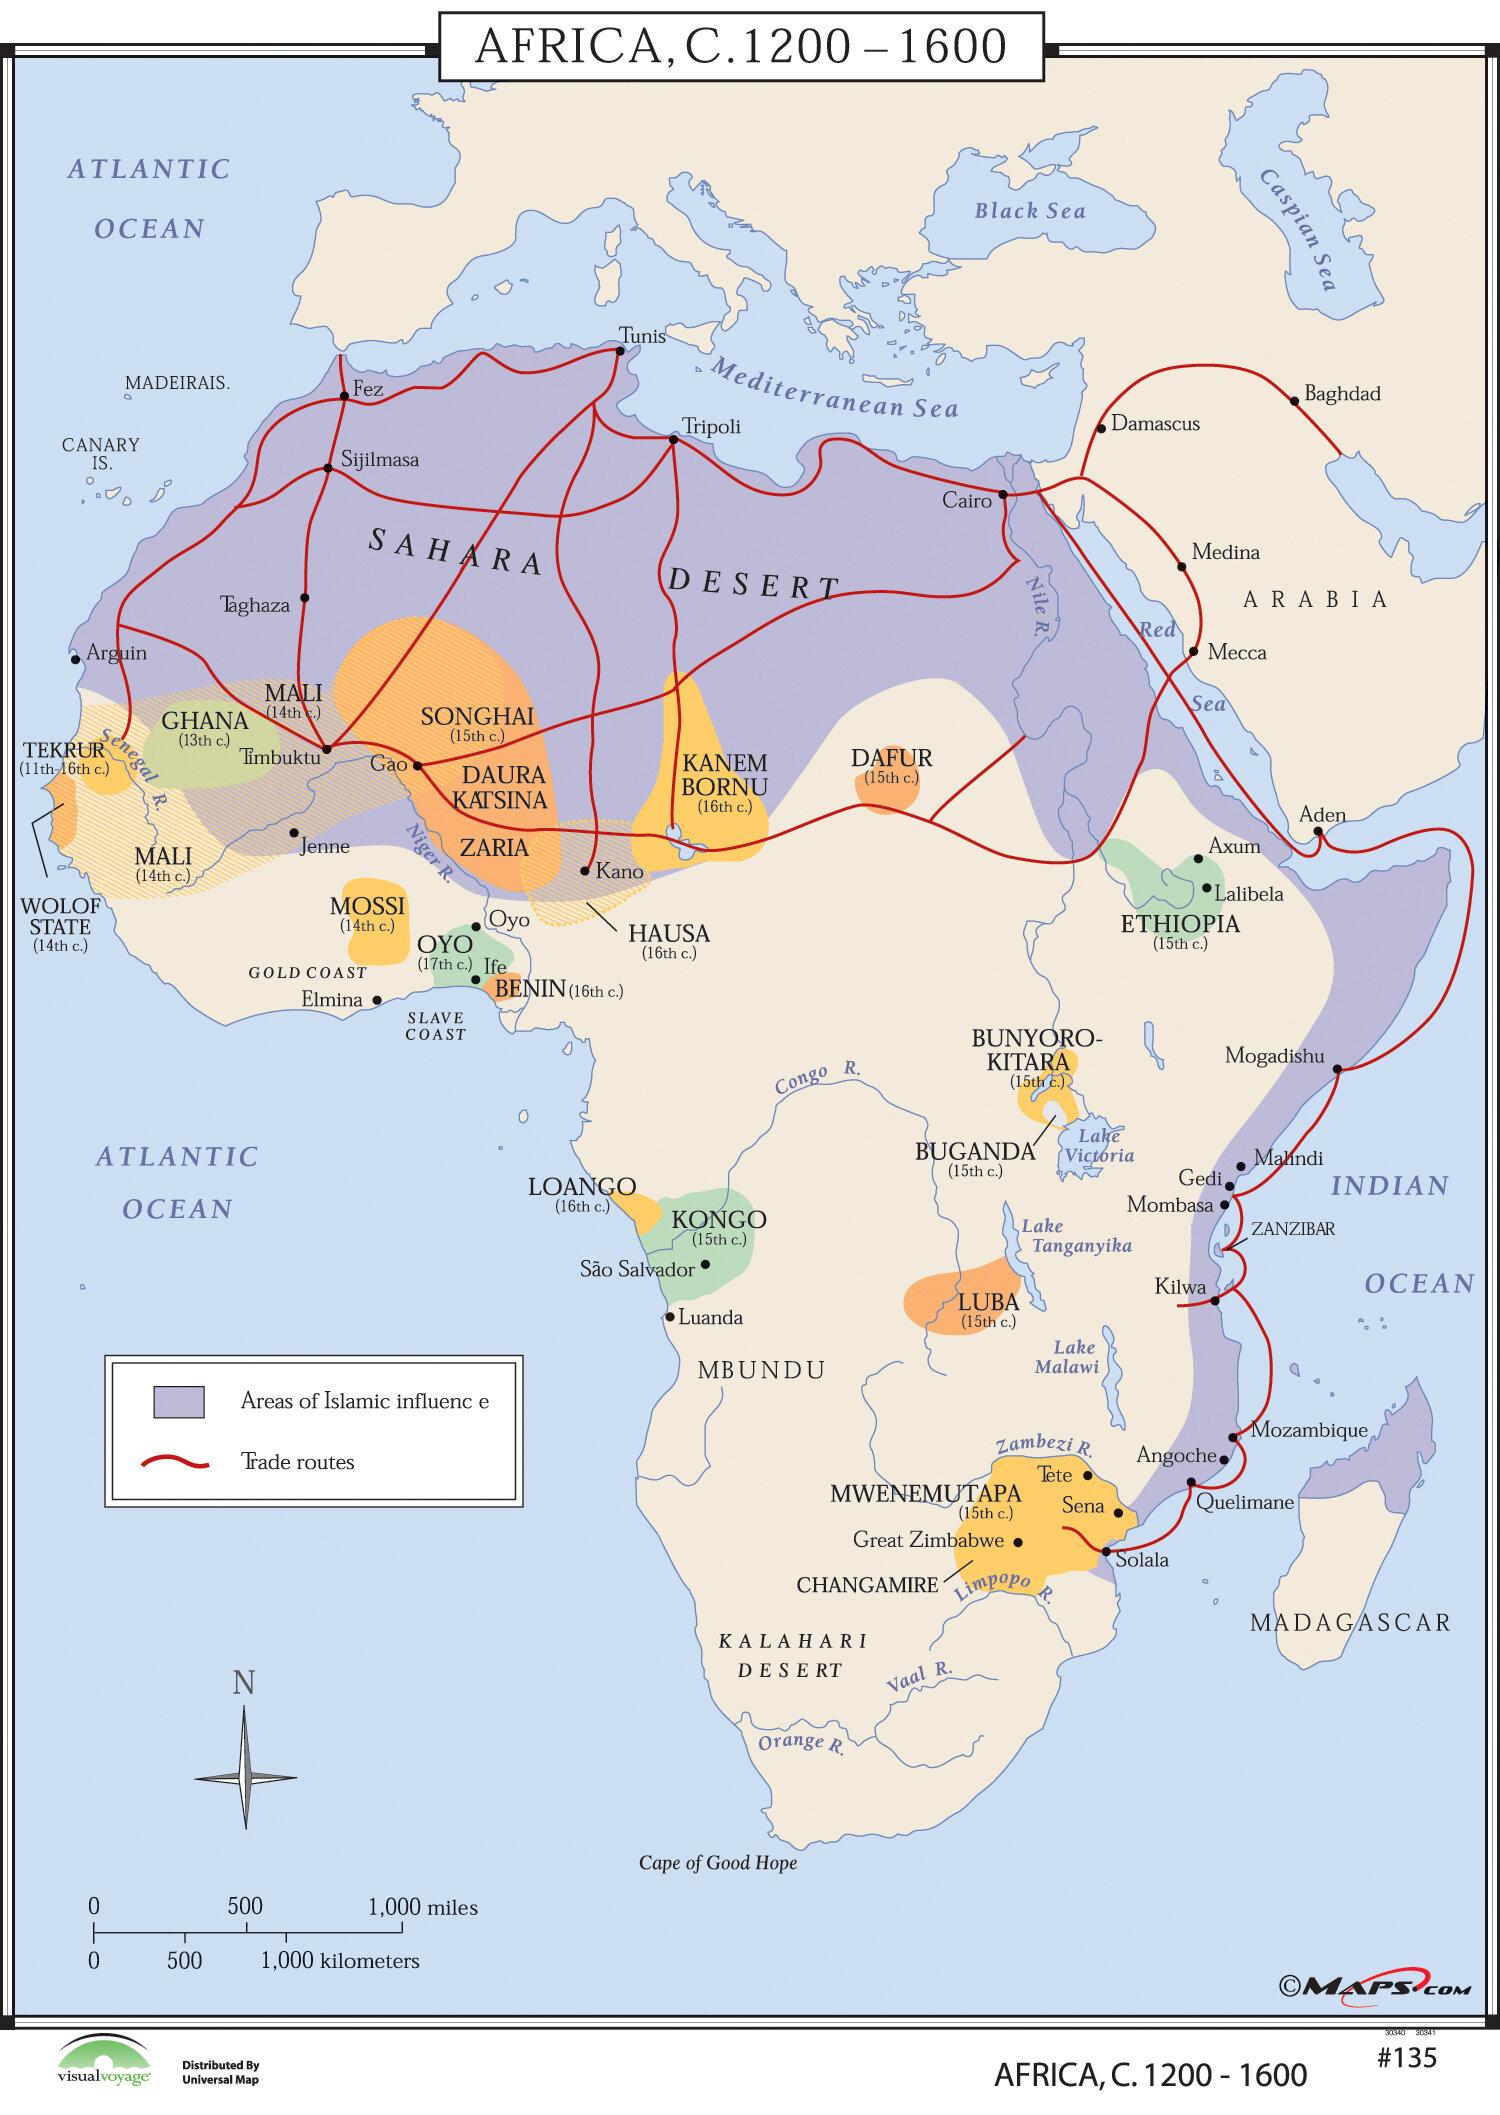 Universal map world history wall maps africa 1200 1600 reviews universal map world history wall maps africa 1200 1600 reviews wayfair gumiabroncs Choice Image